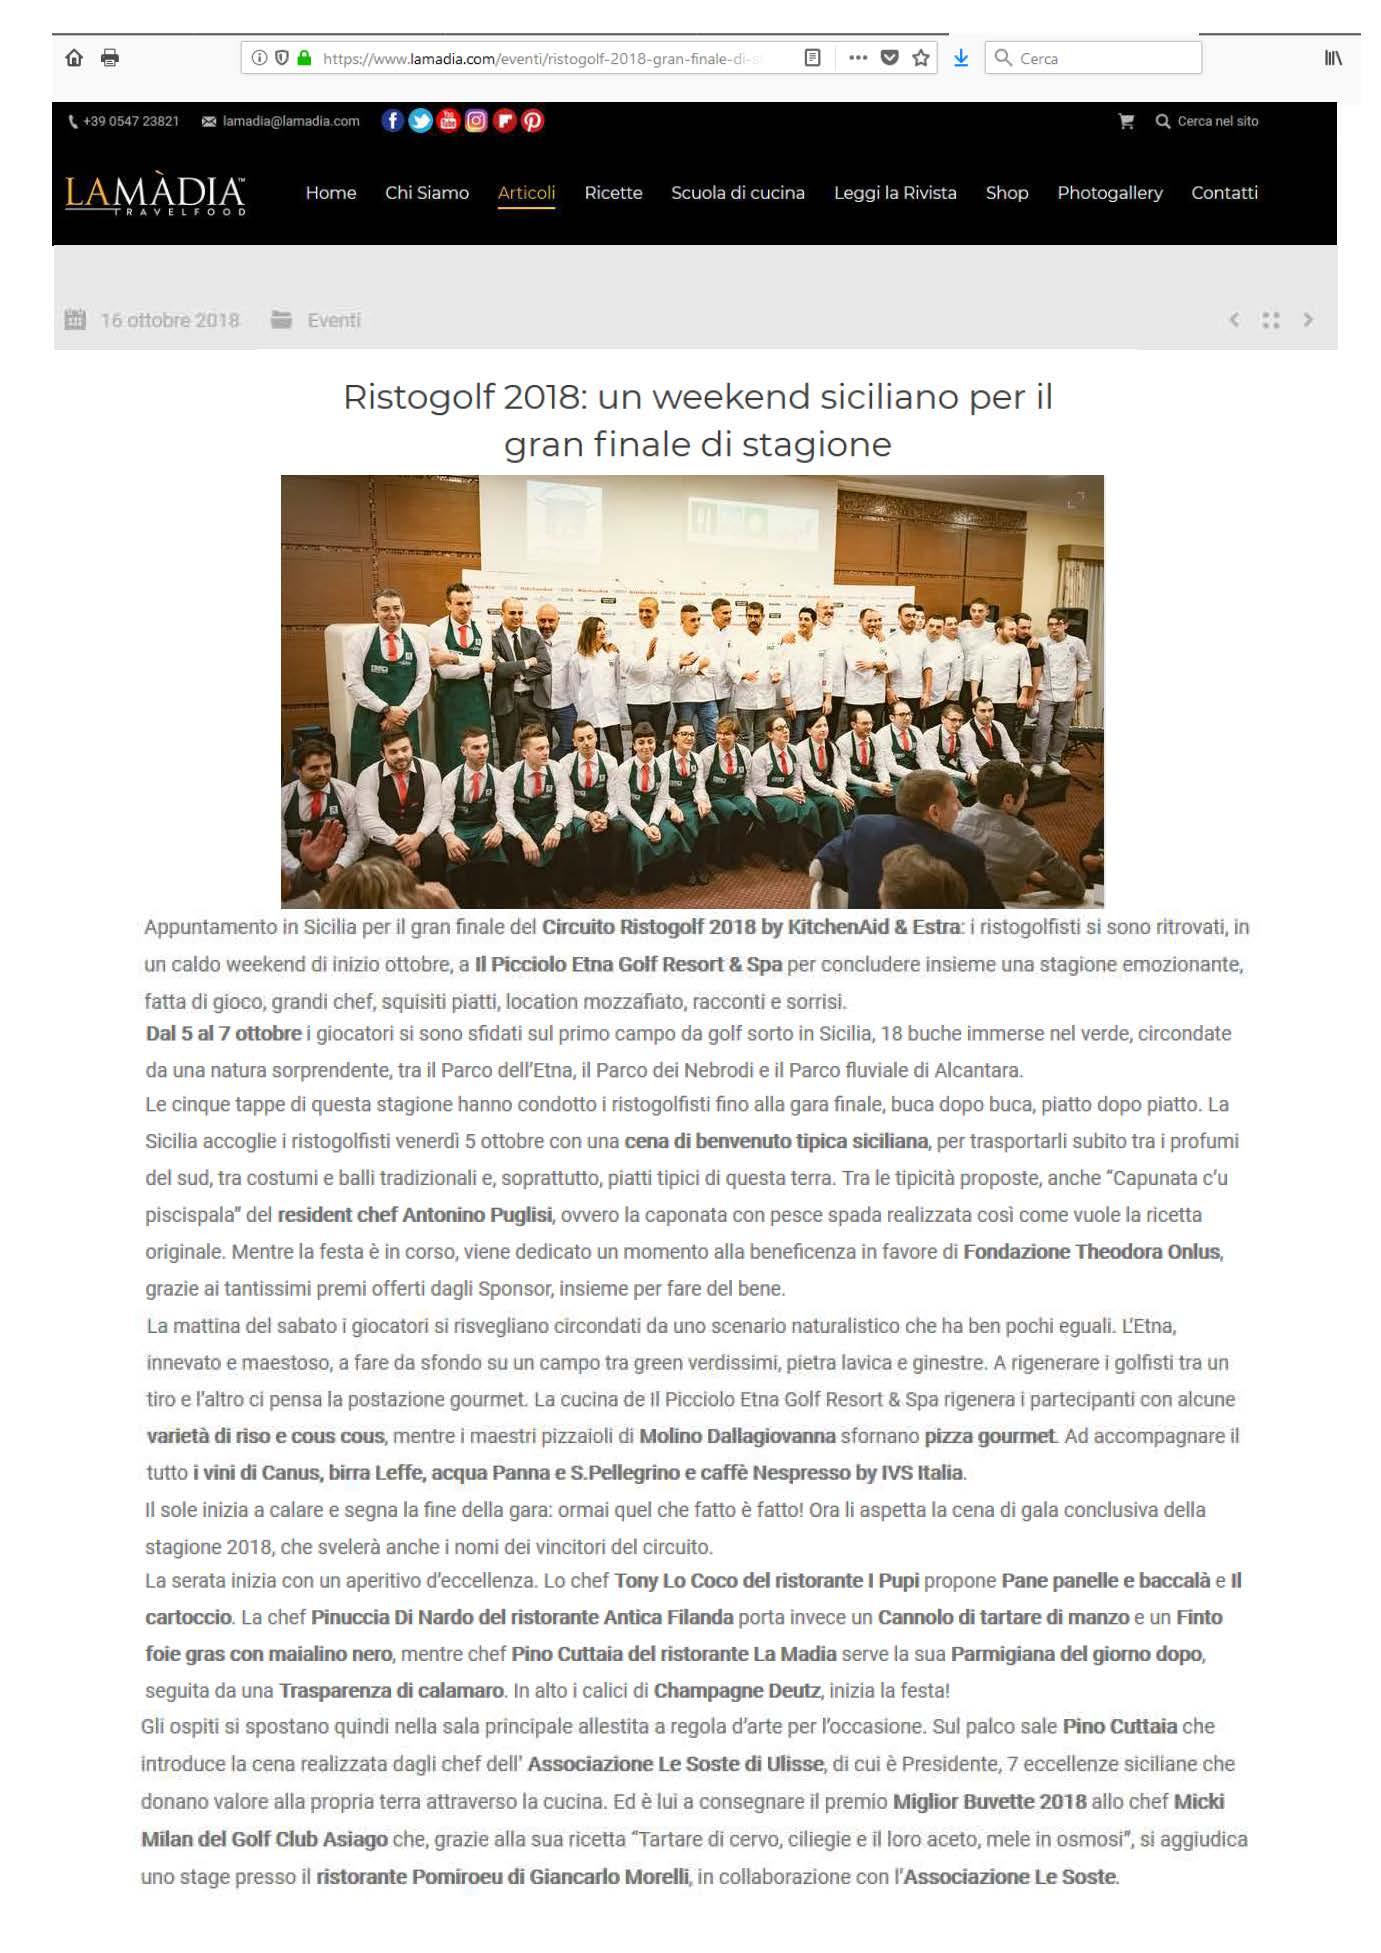 2018.10.16 La Madia web_Page_1